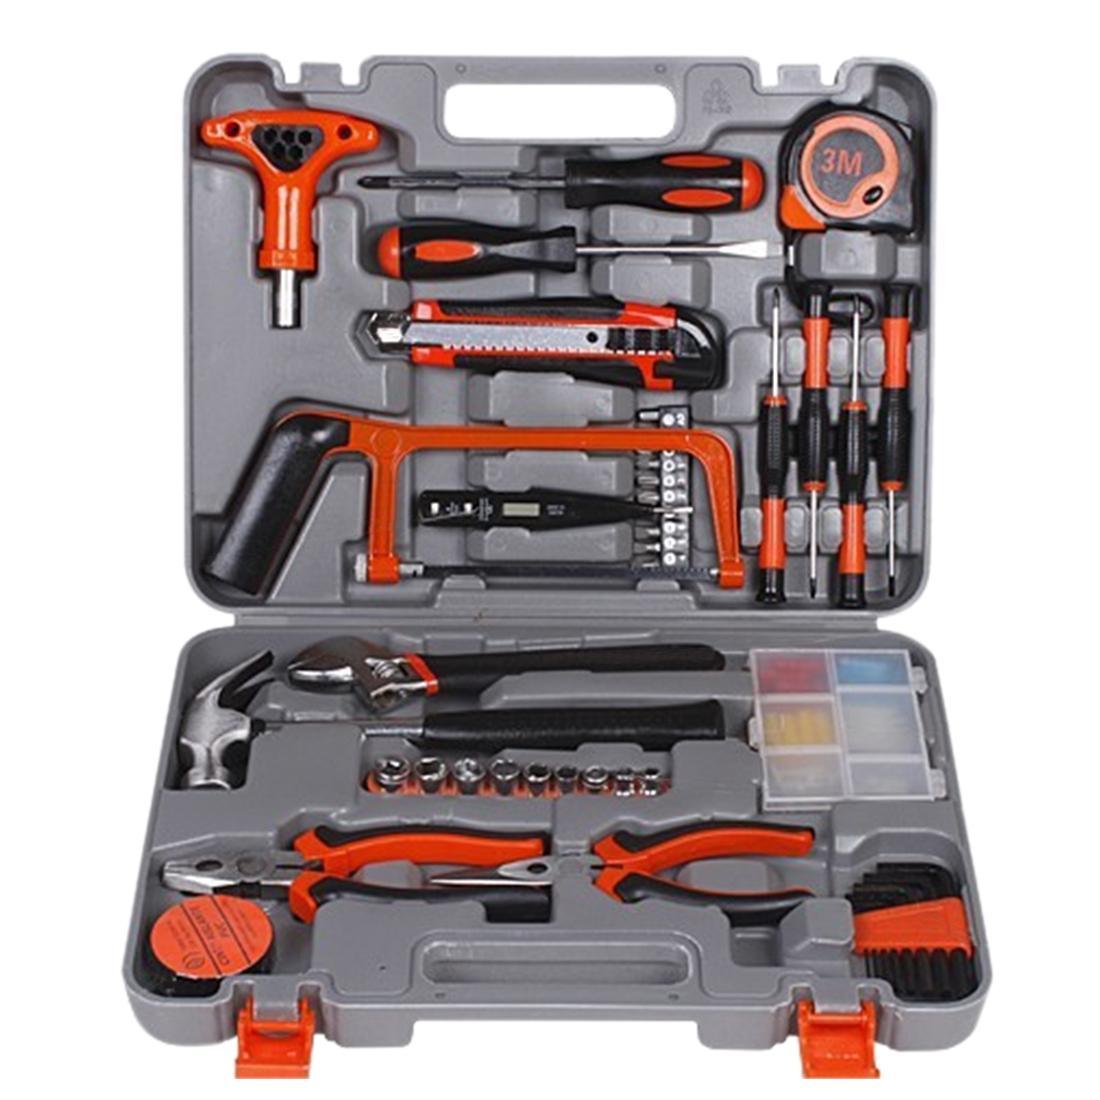 360DSC 82Pcs Set General Household-hardware Tool Kit With Toolbox Storage Case - intl